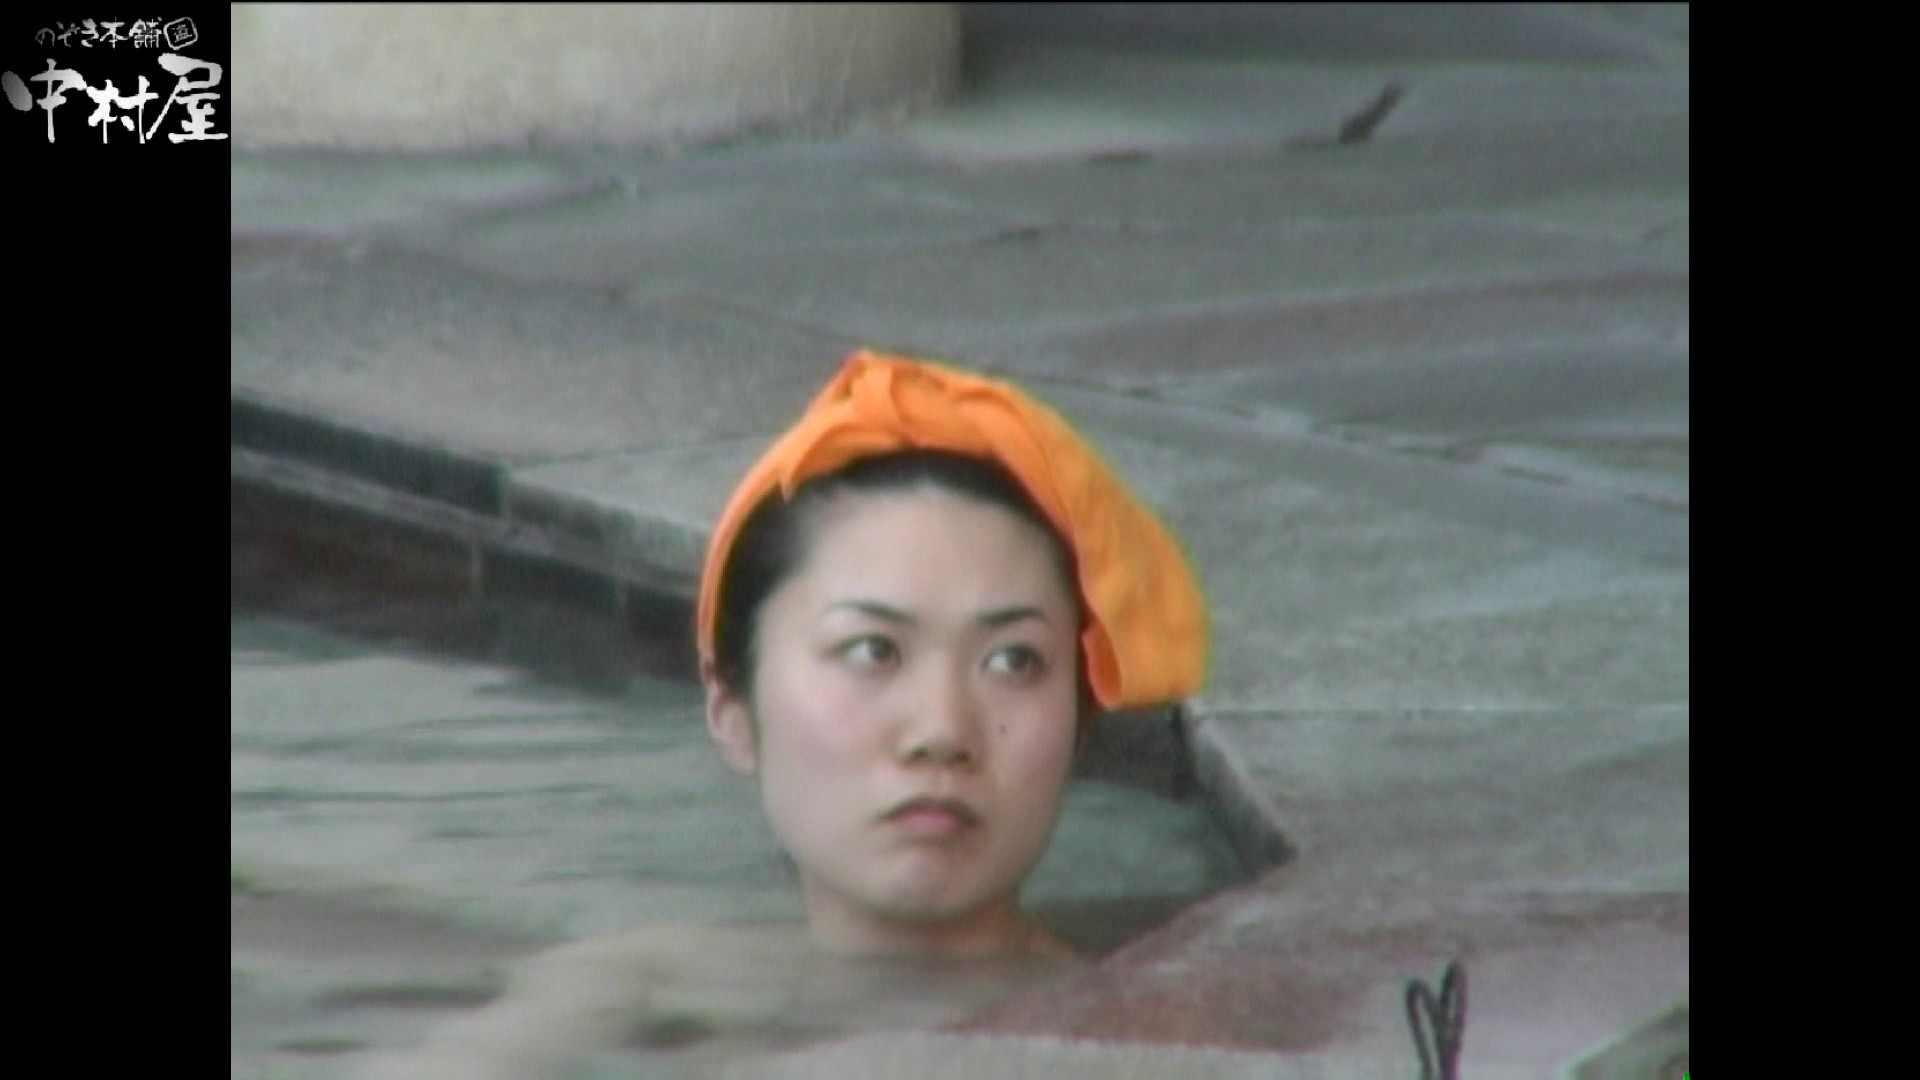 Aquaな露天風呂Vol.978 OL女体  88連発 69